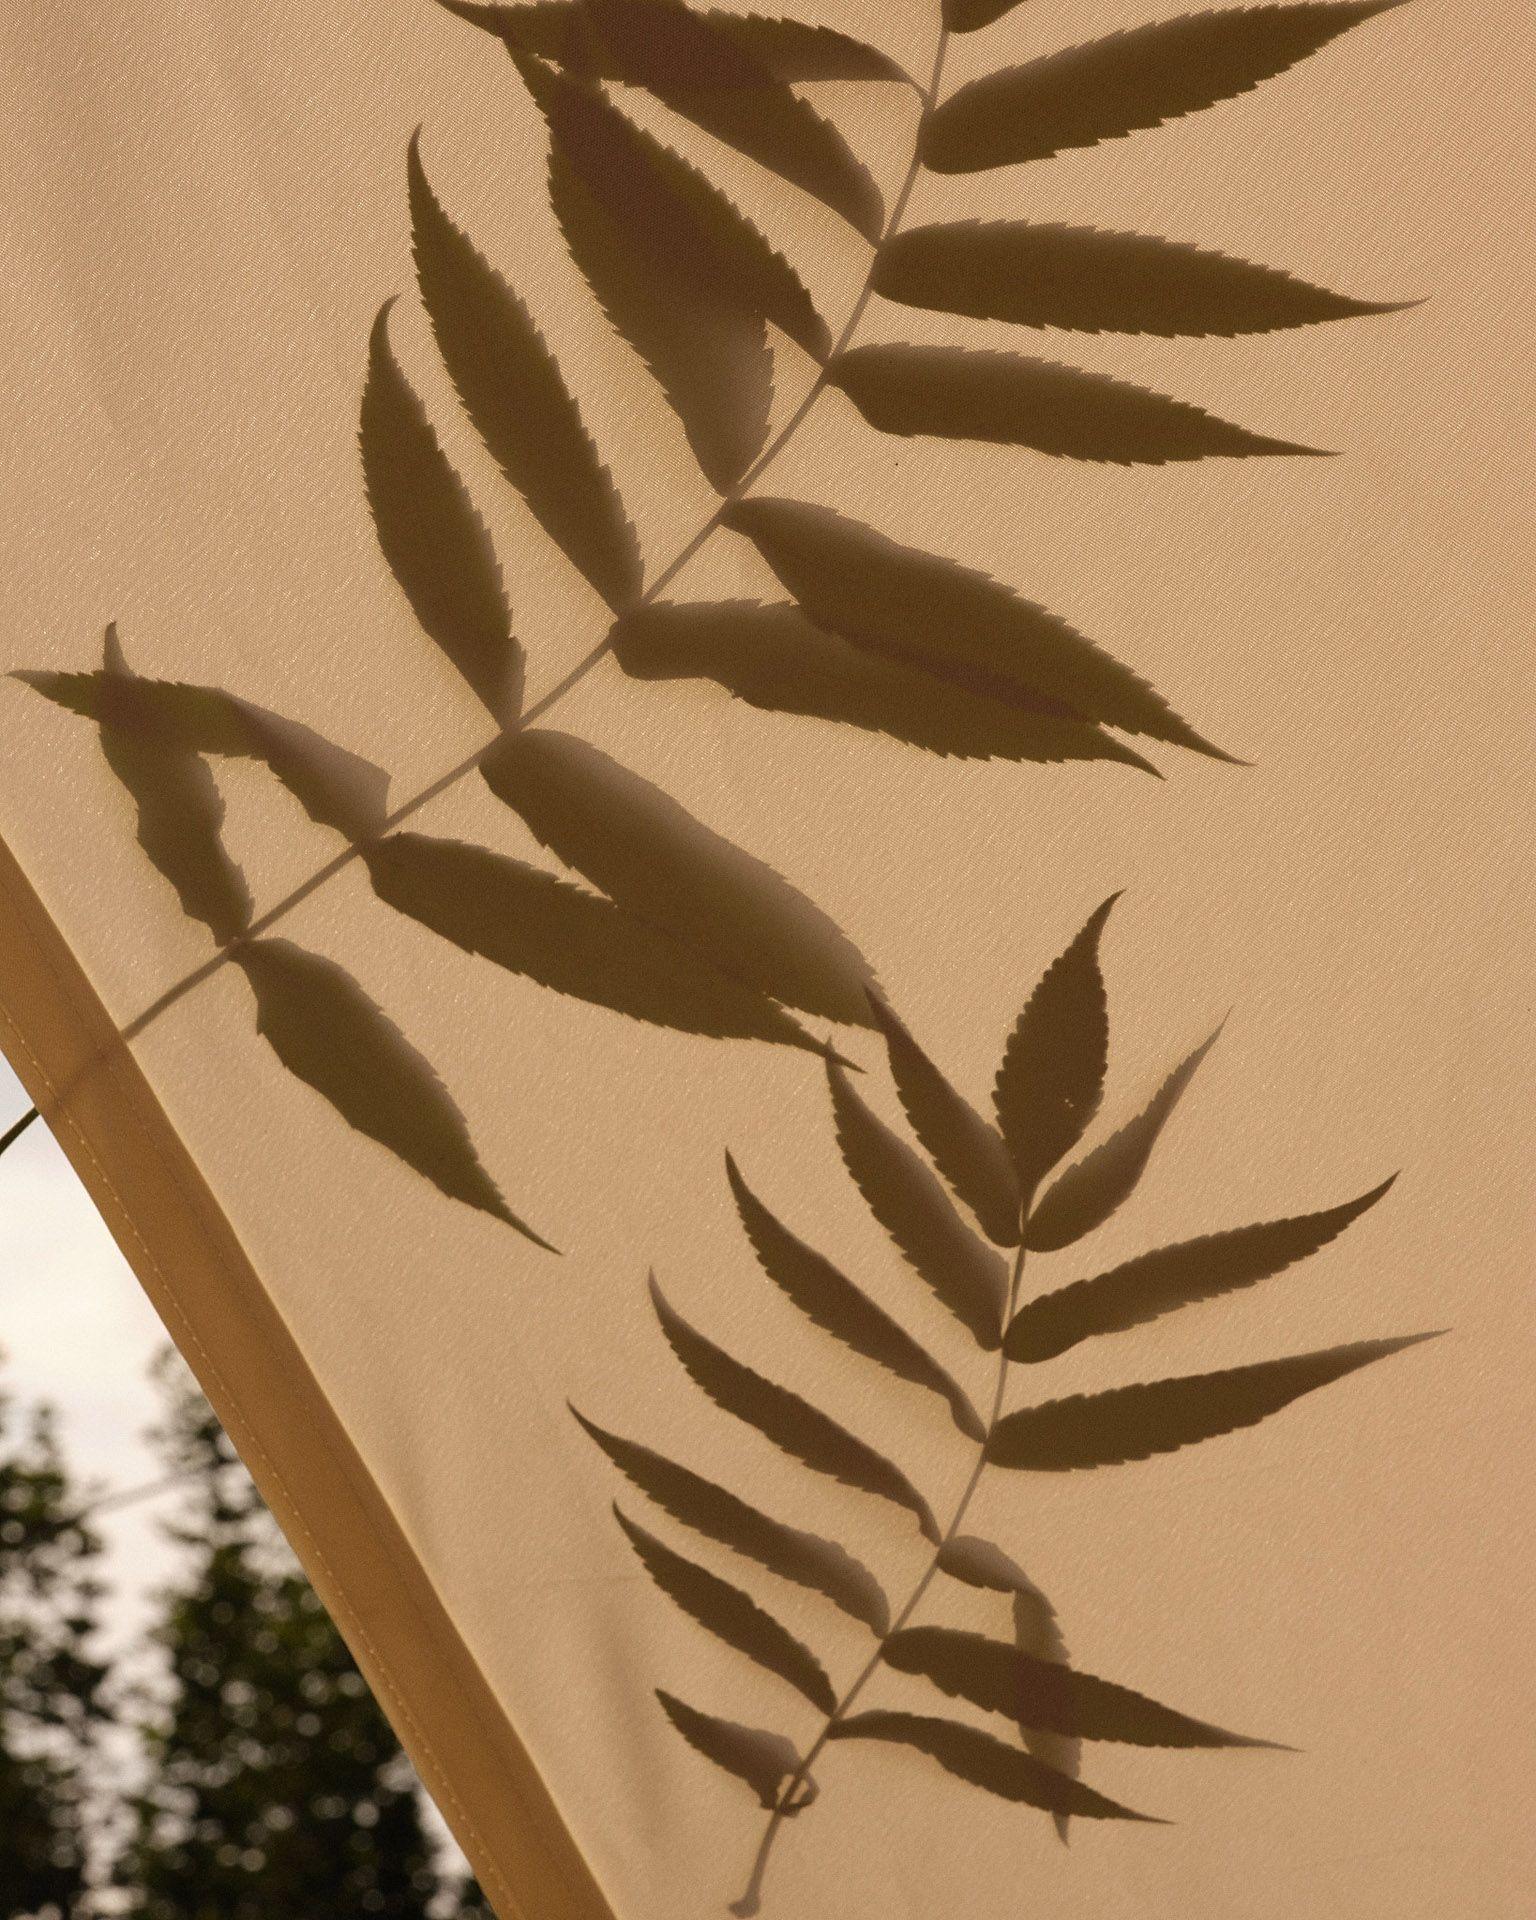 leaf shadows on fabric by Maxyme G Delisle for Flanelle Magazine